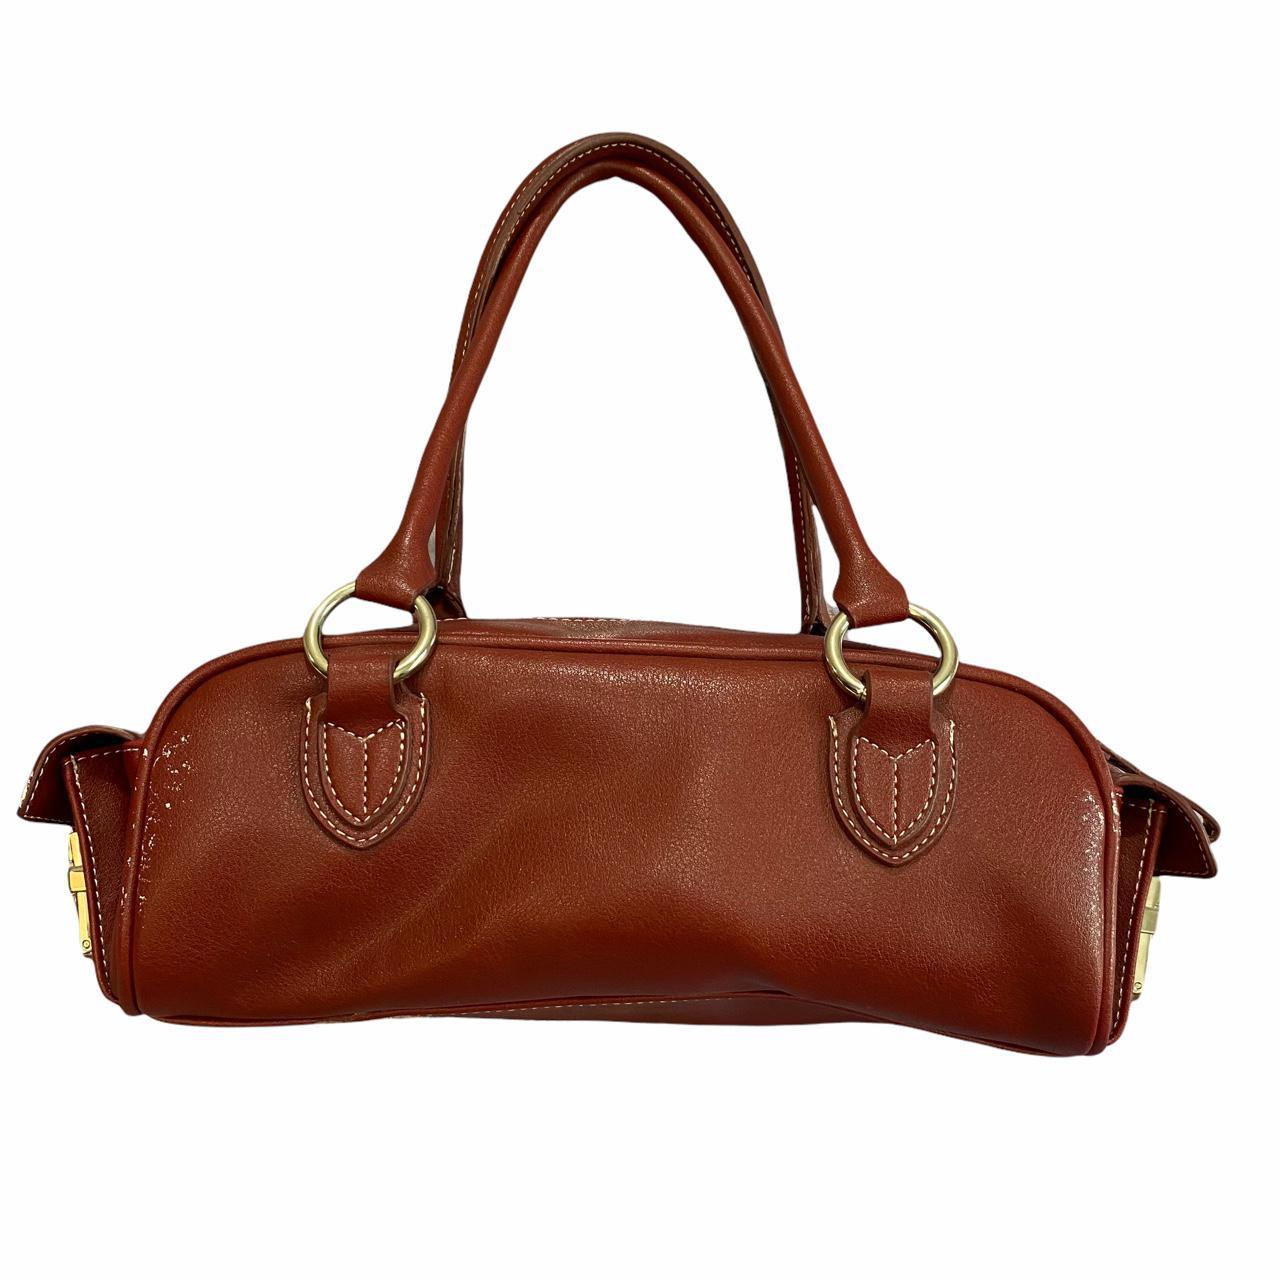 Product Image 1 - Vintage y2k Faux Leather Mini